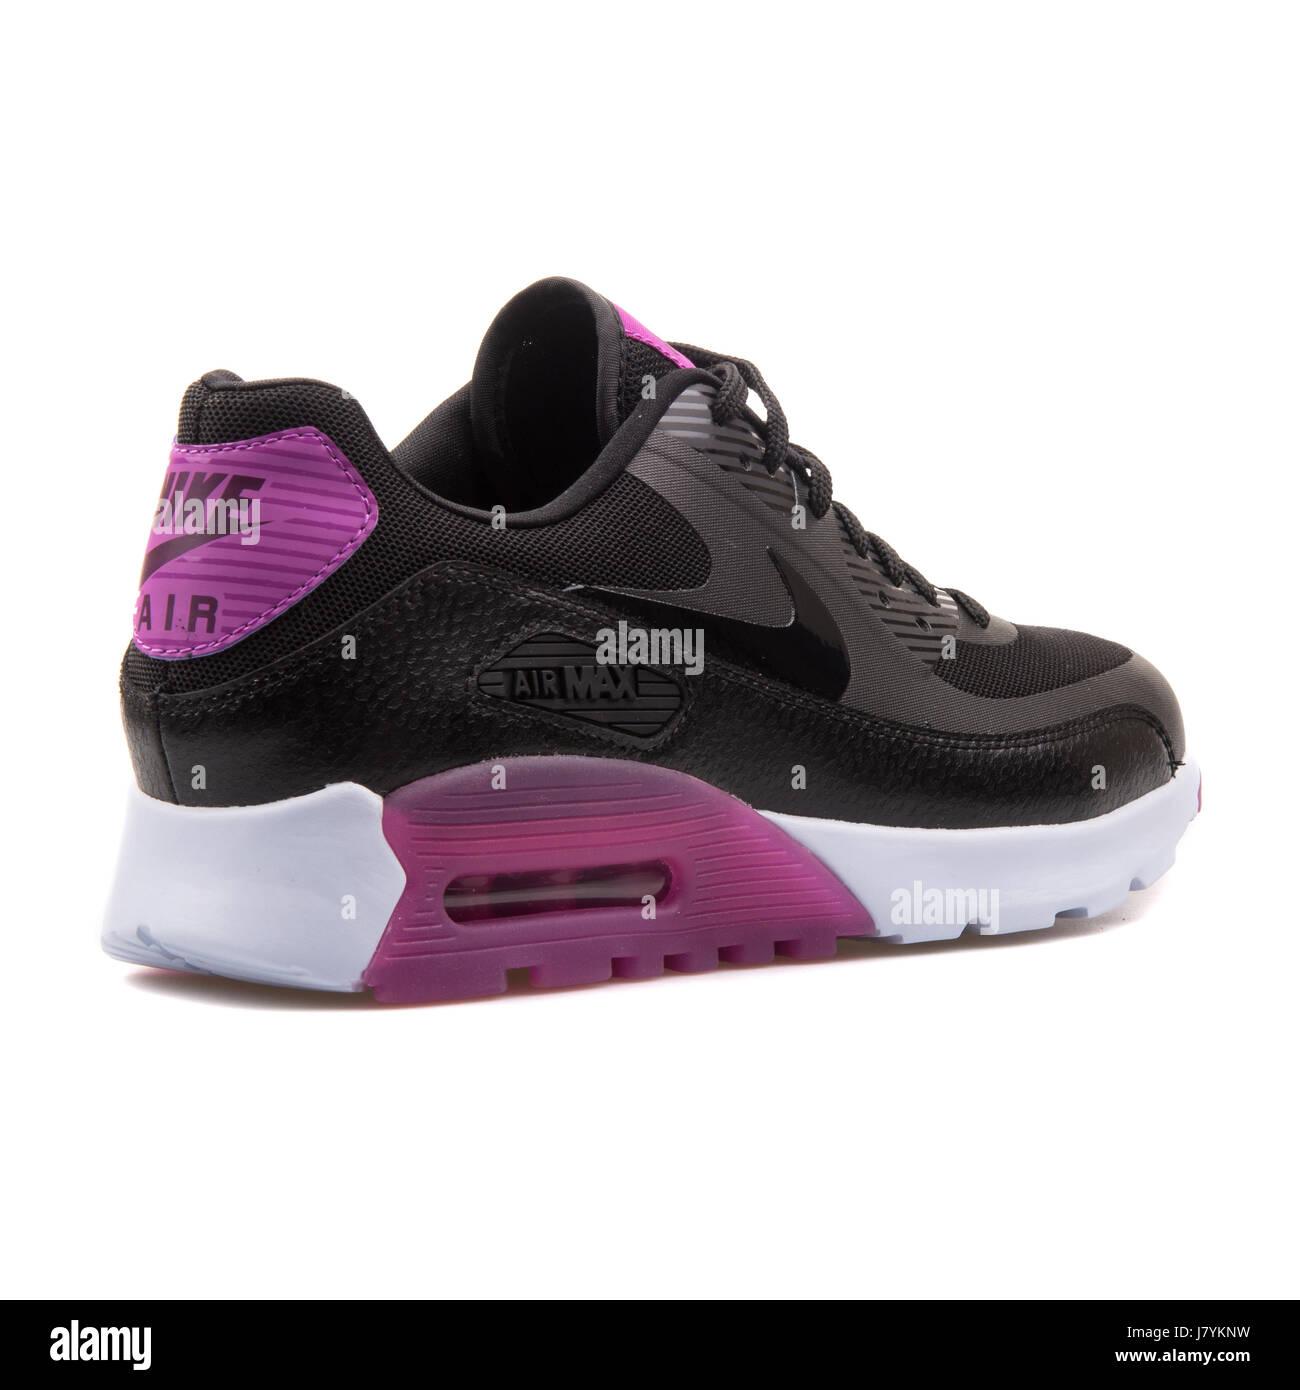 W Nike Air Max 90 femmes essentiel ultra violet et noir ...